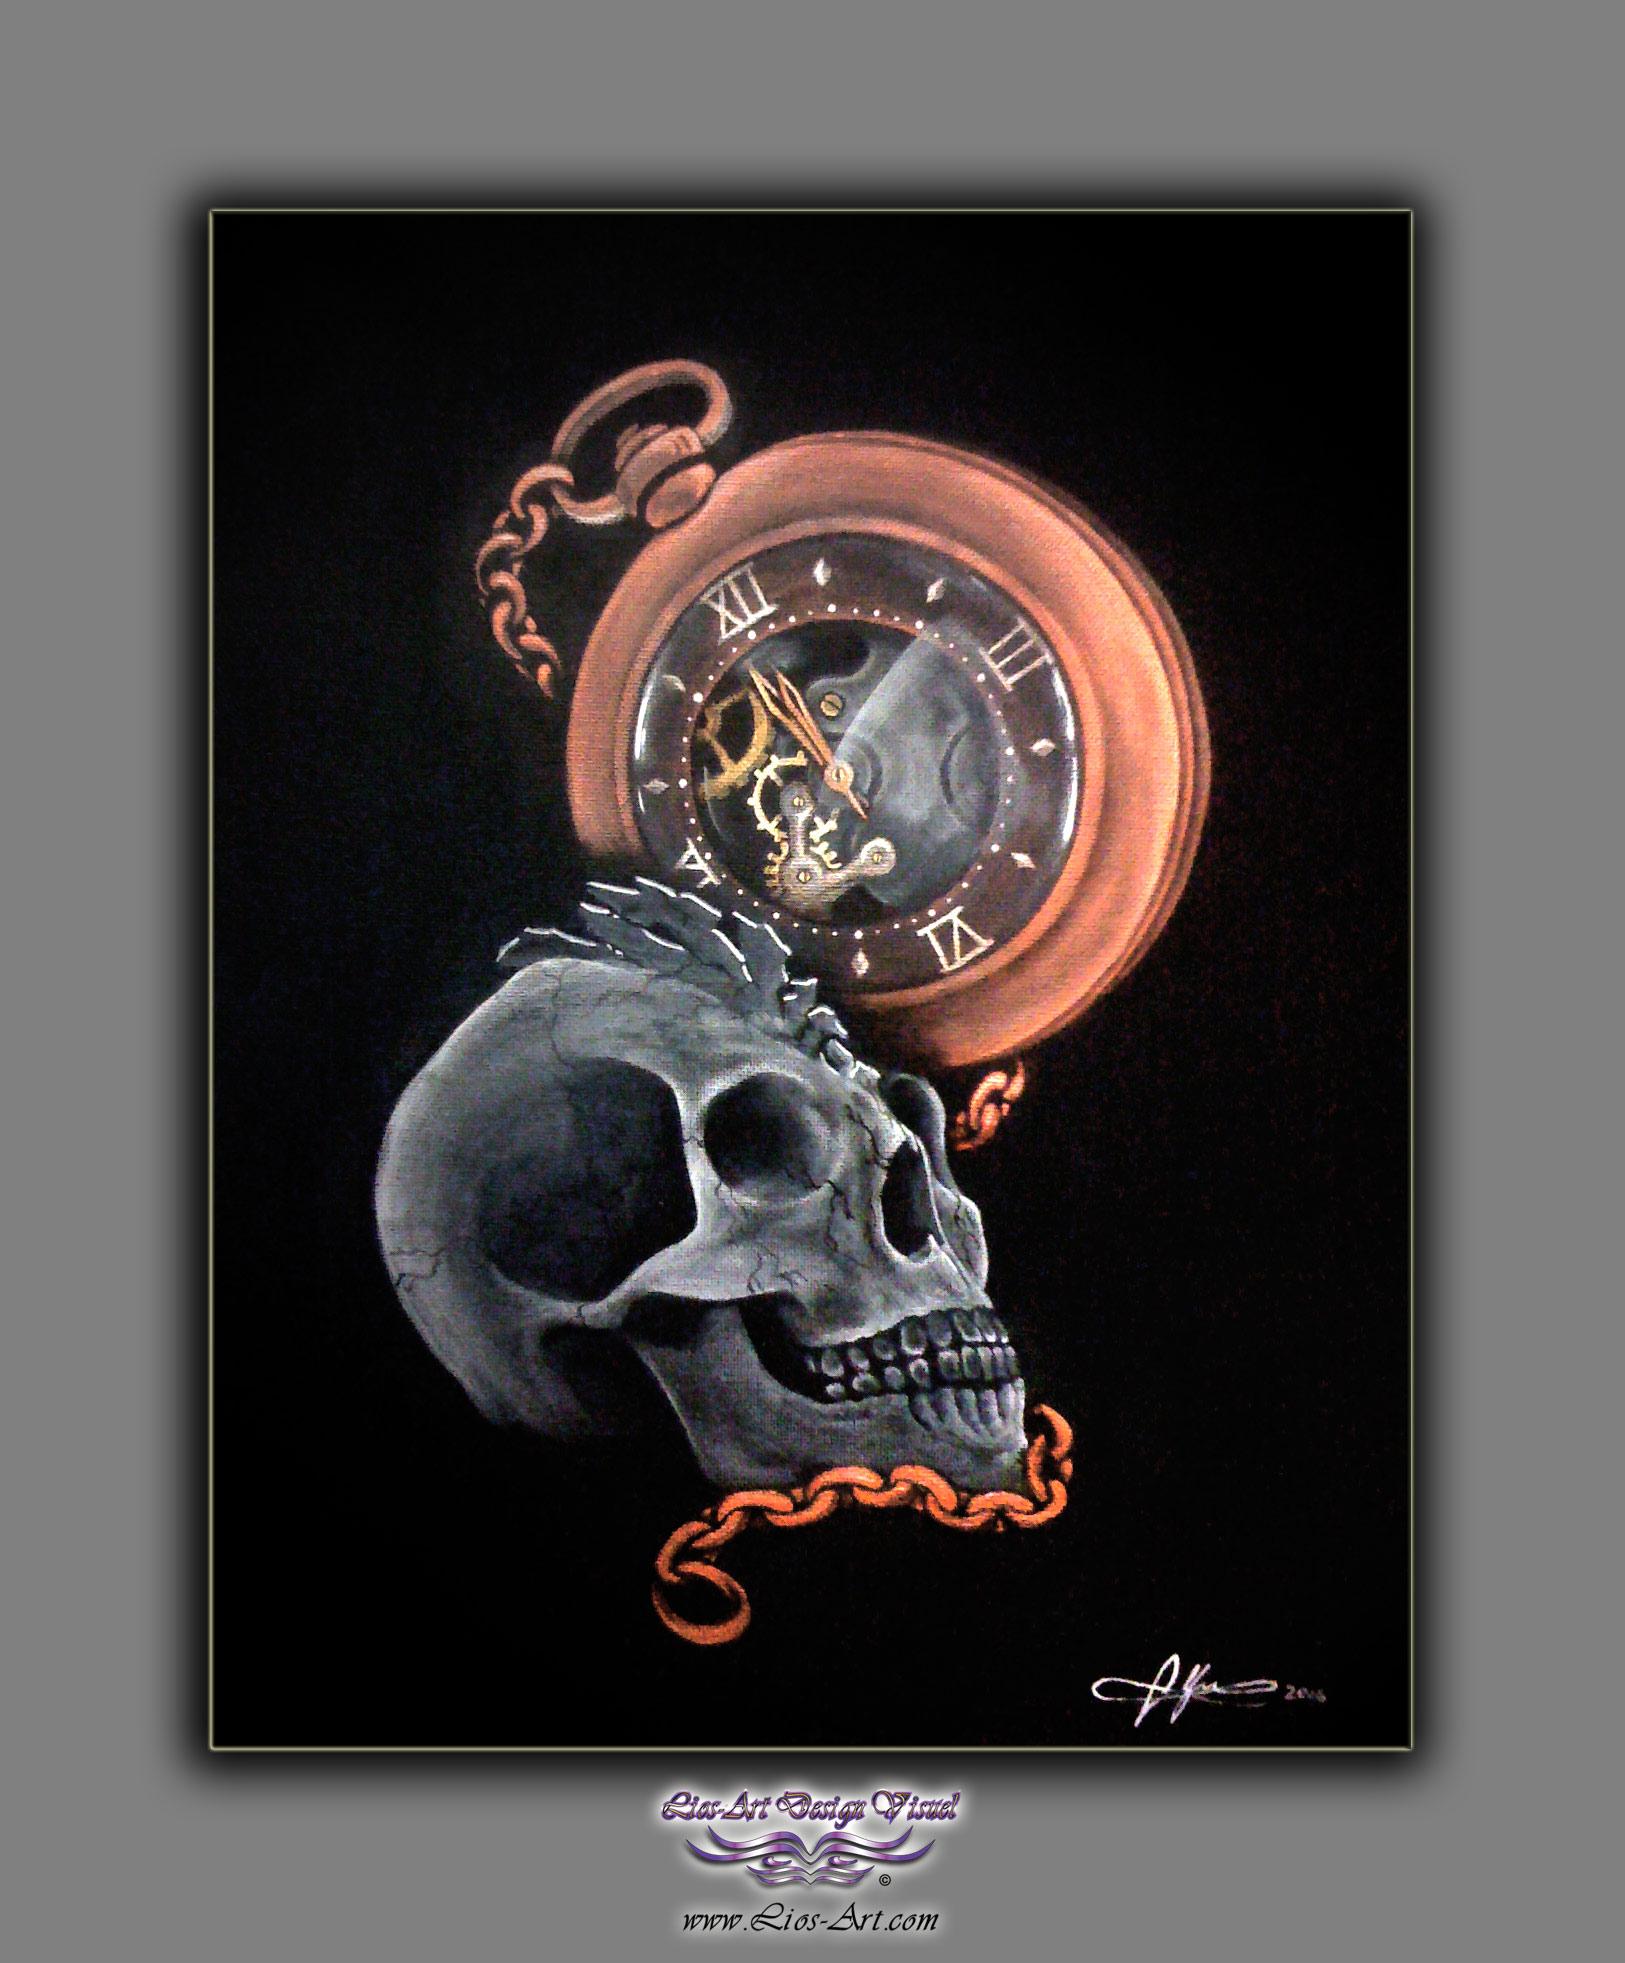 Time-kills6.jpg